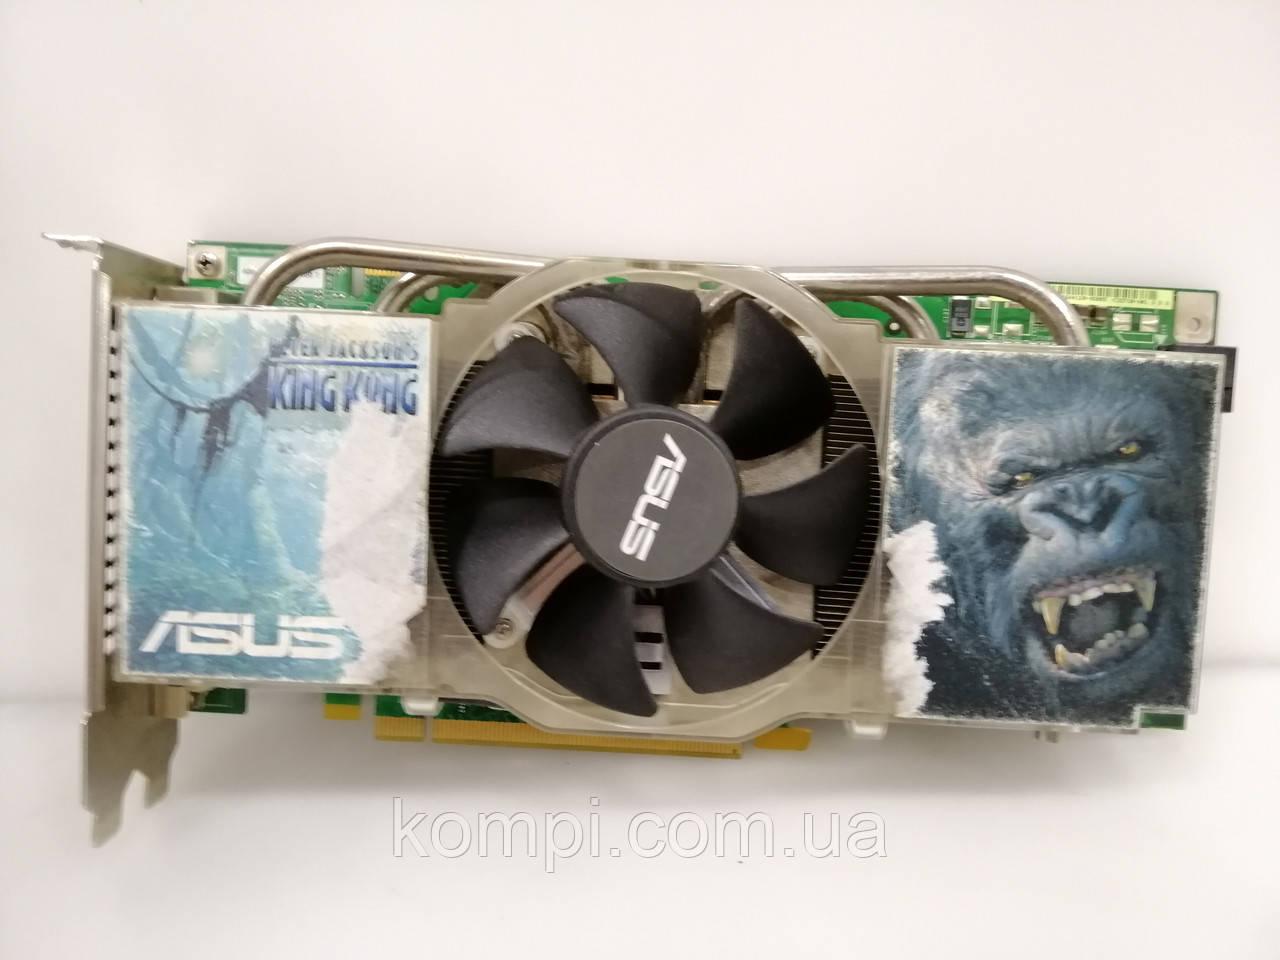 Видеокарта NVIDIA 7900GTX 512MB PCI-E